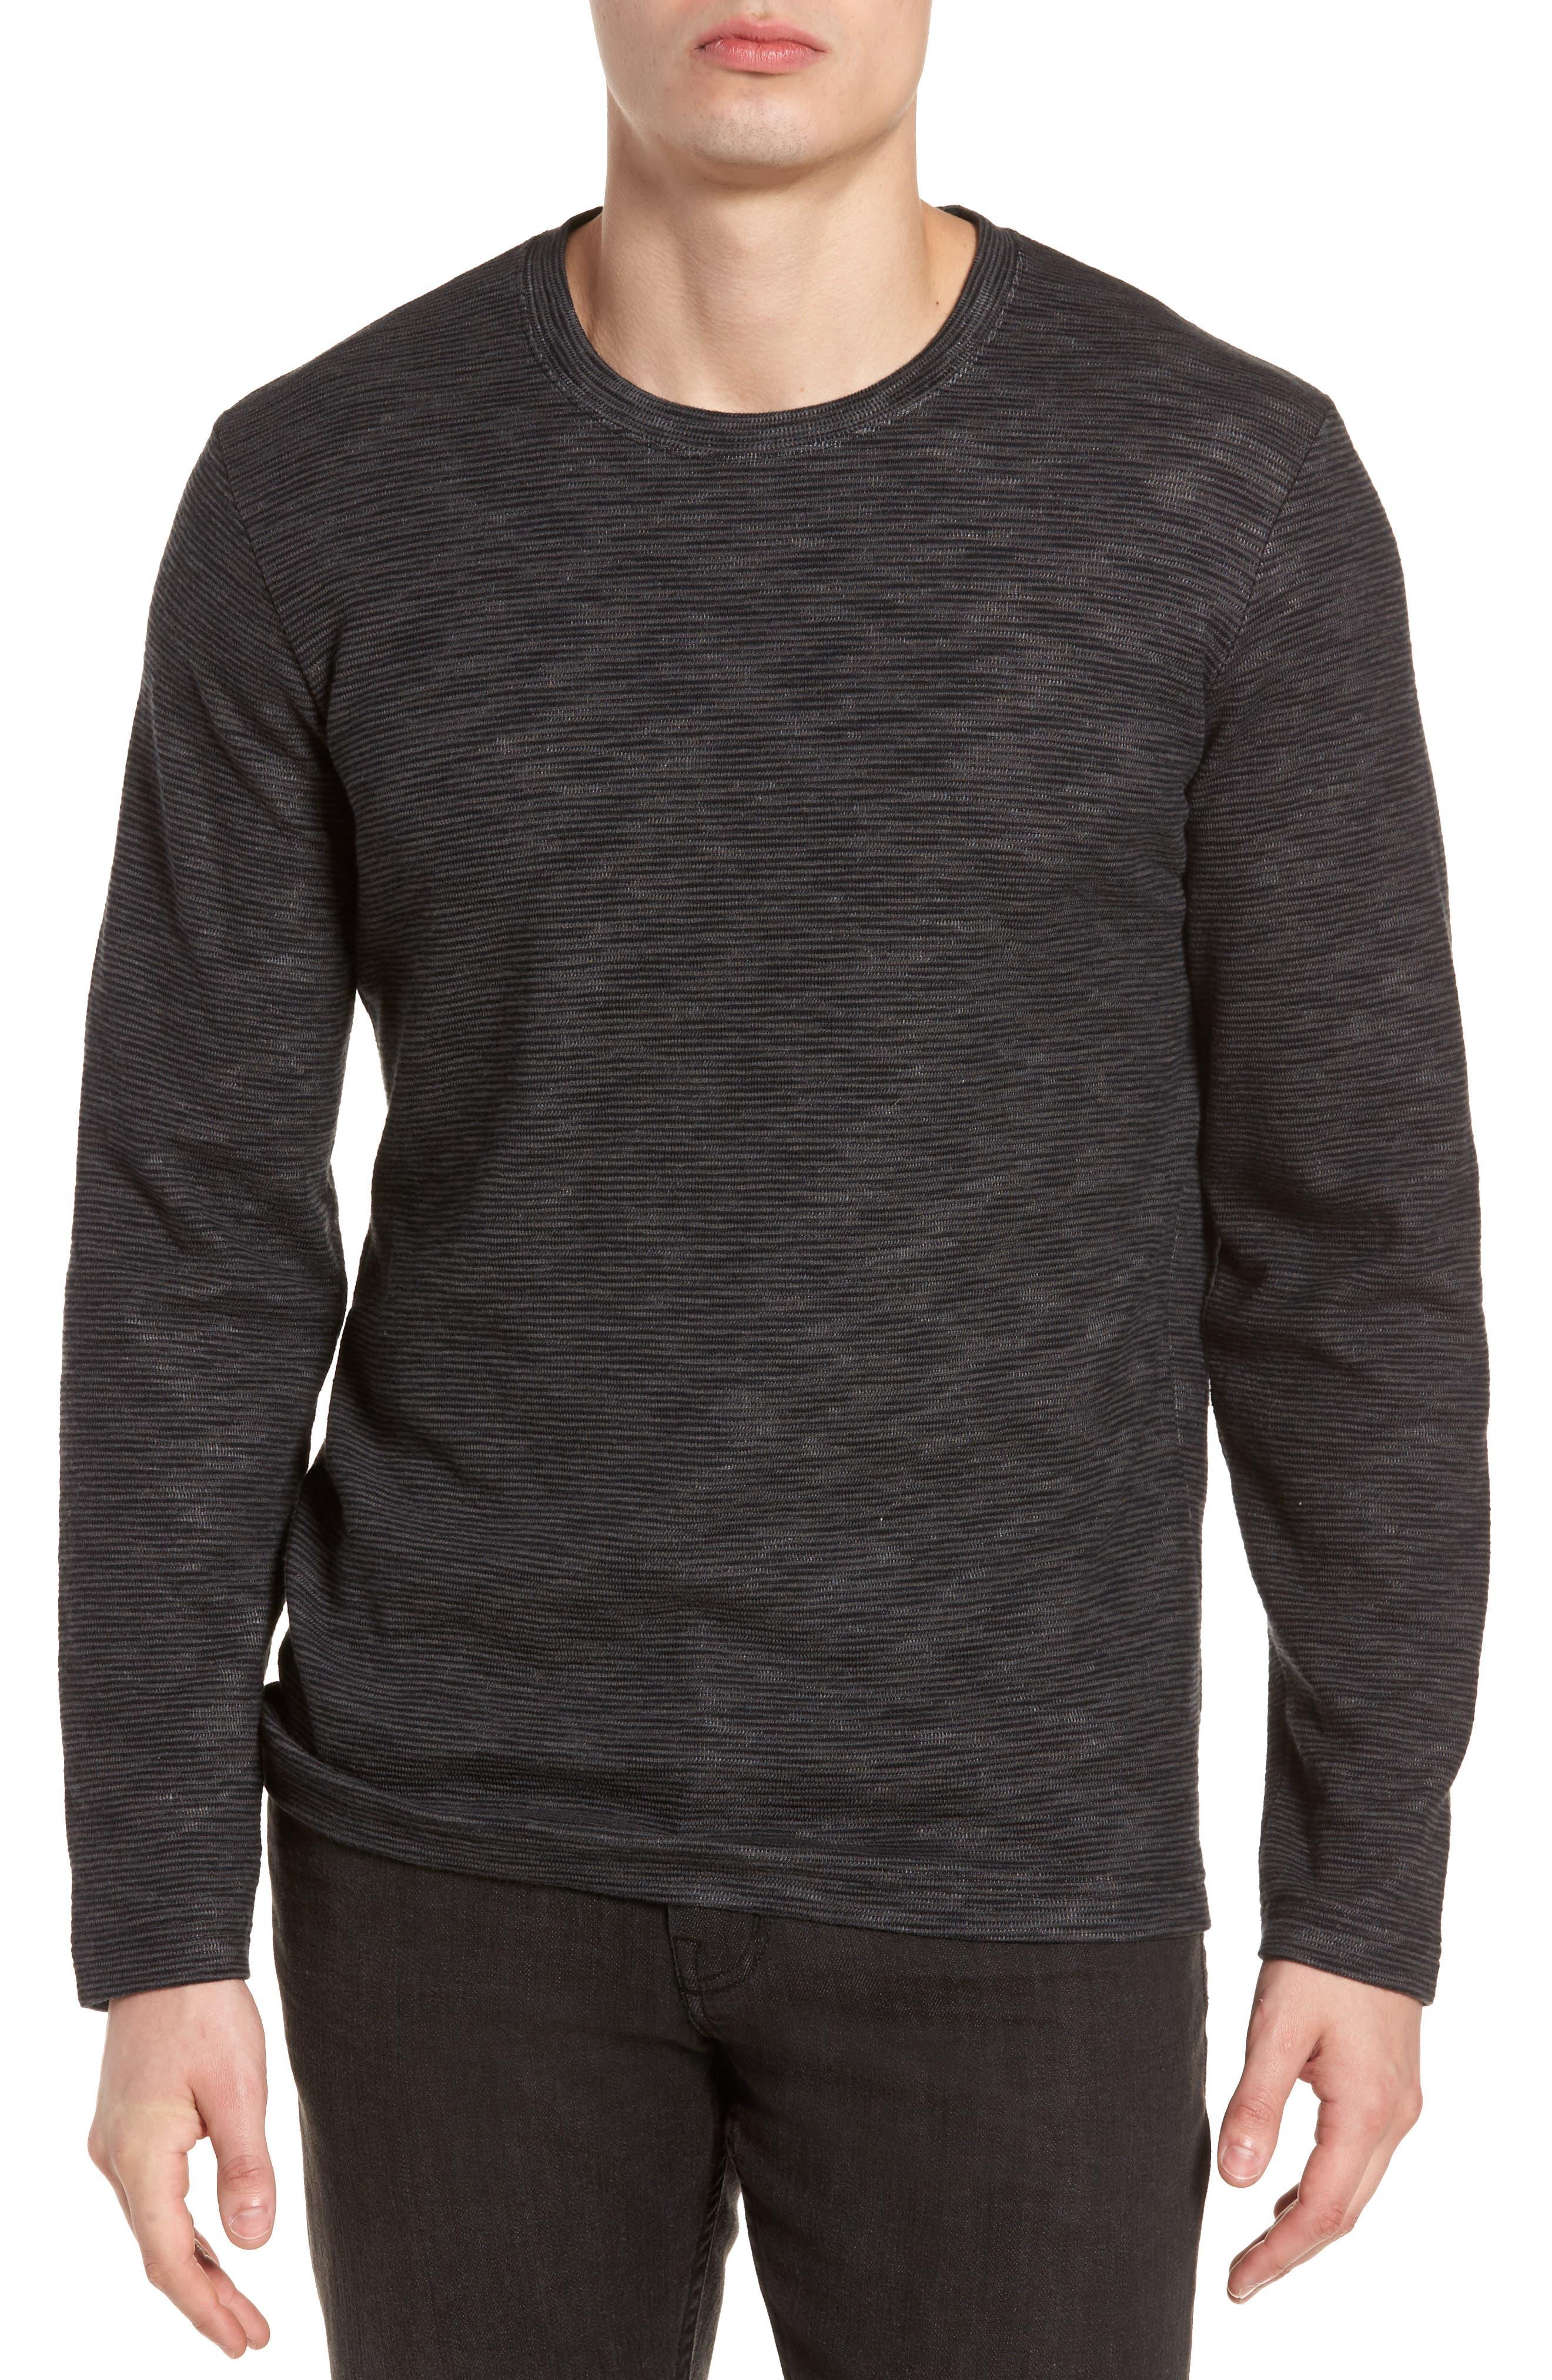 Digs Pullover,                         Main,                         color, Black/ Grey Pinstripe